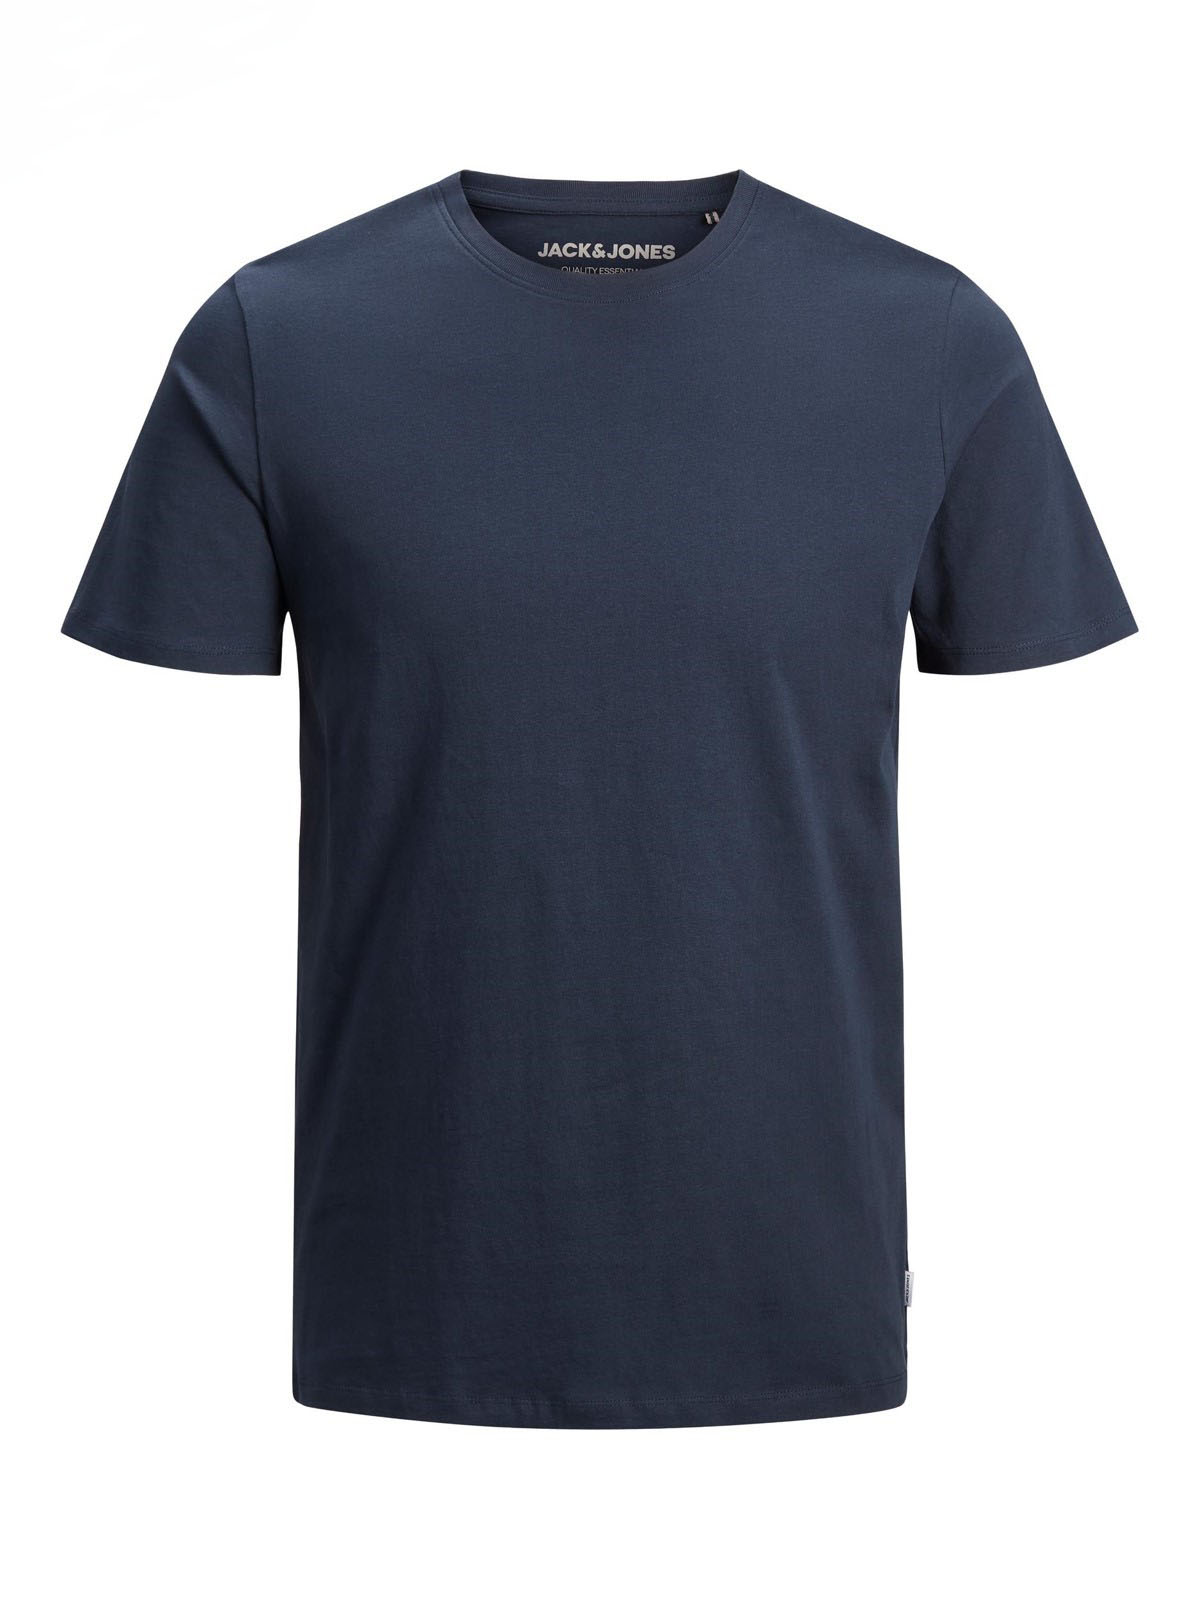 Jack & Jones Organic Basic t-shirt, navy blazer, small